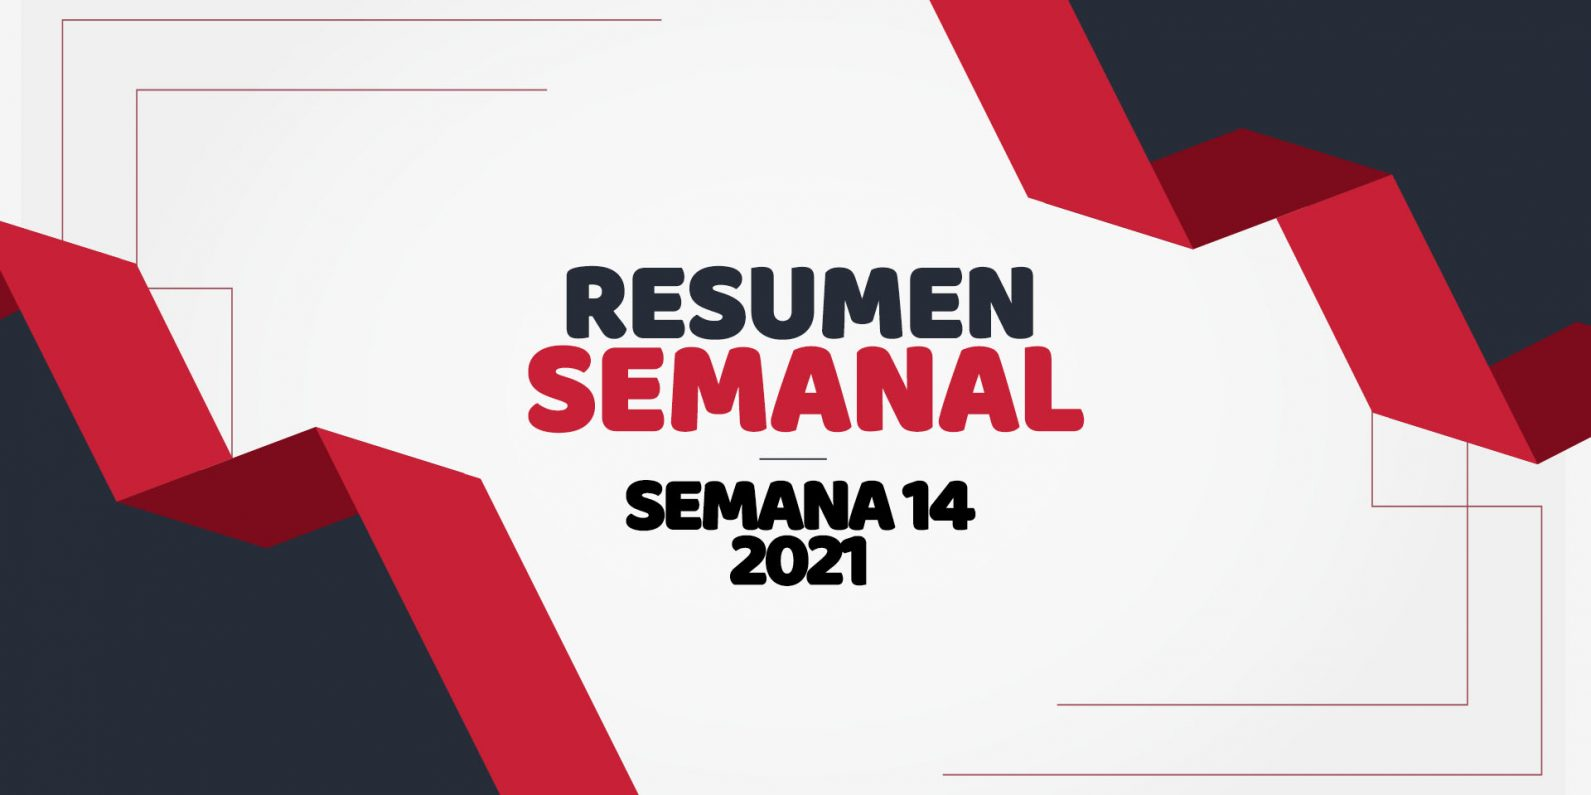 Resumen semanal Semana 14 2021